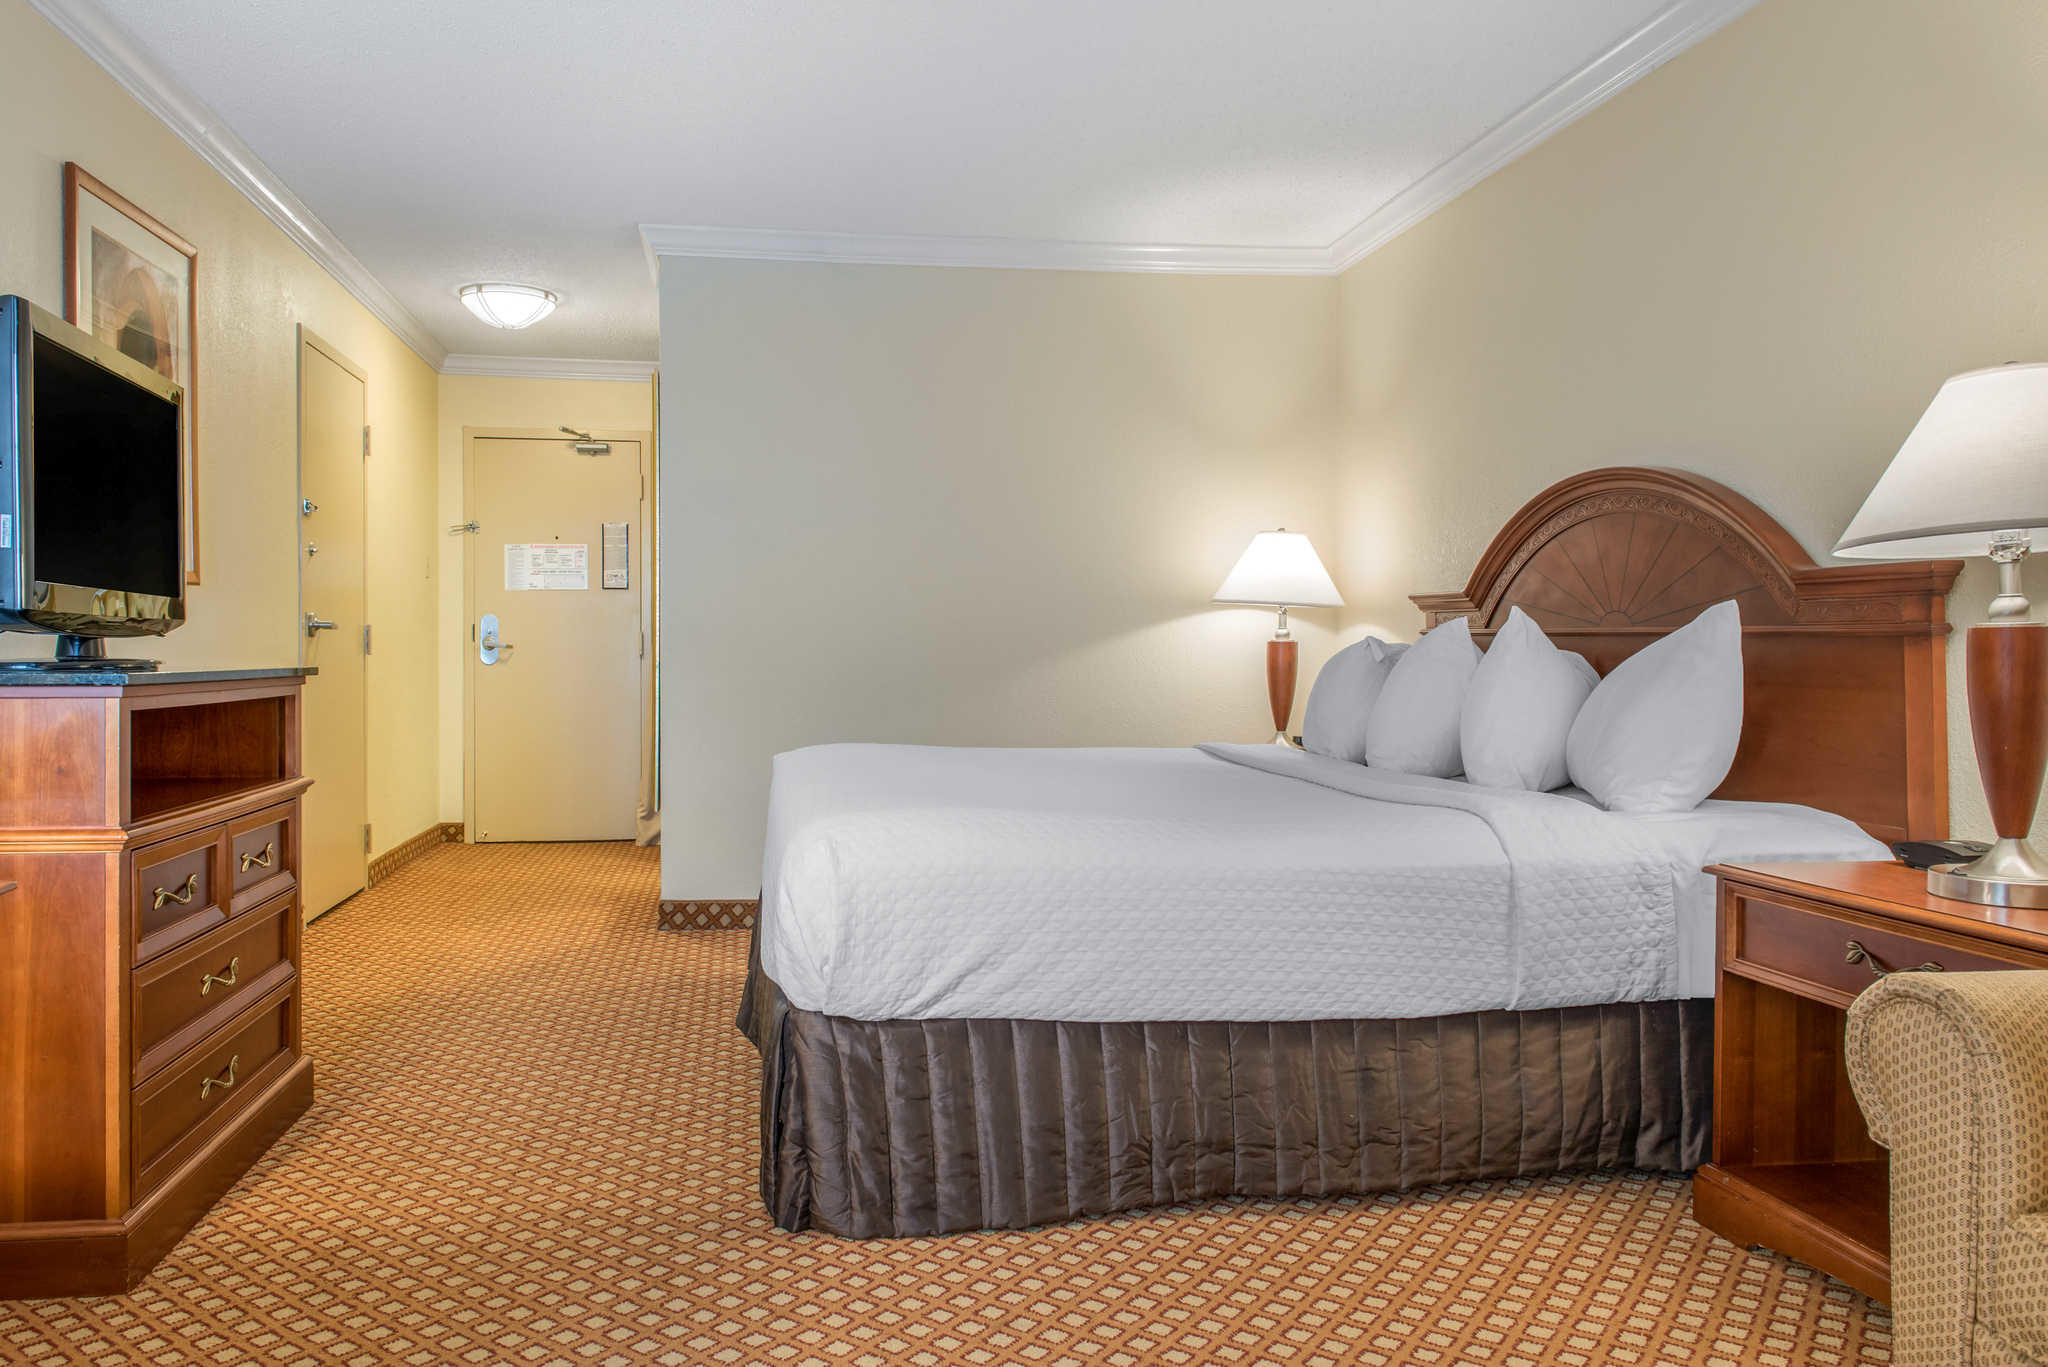 Quality Hotel - Cincinnati Blue Ash image 13